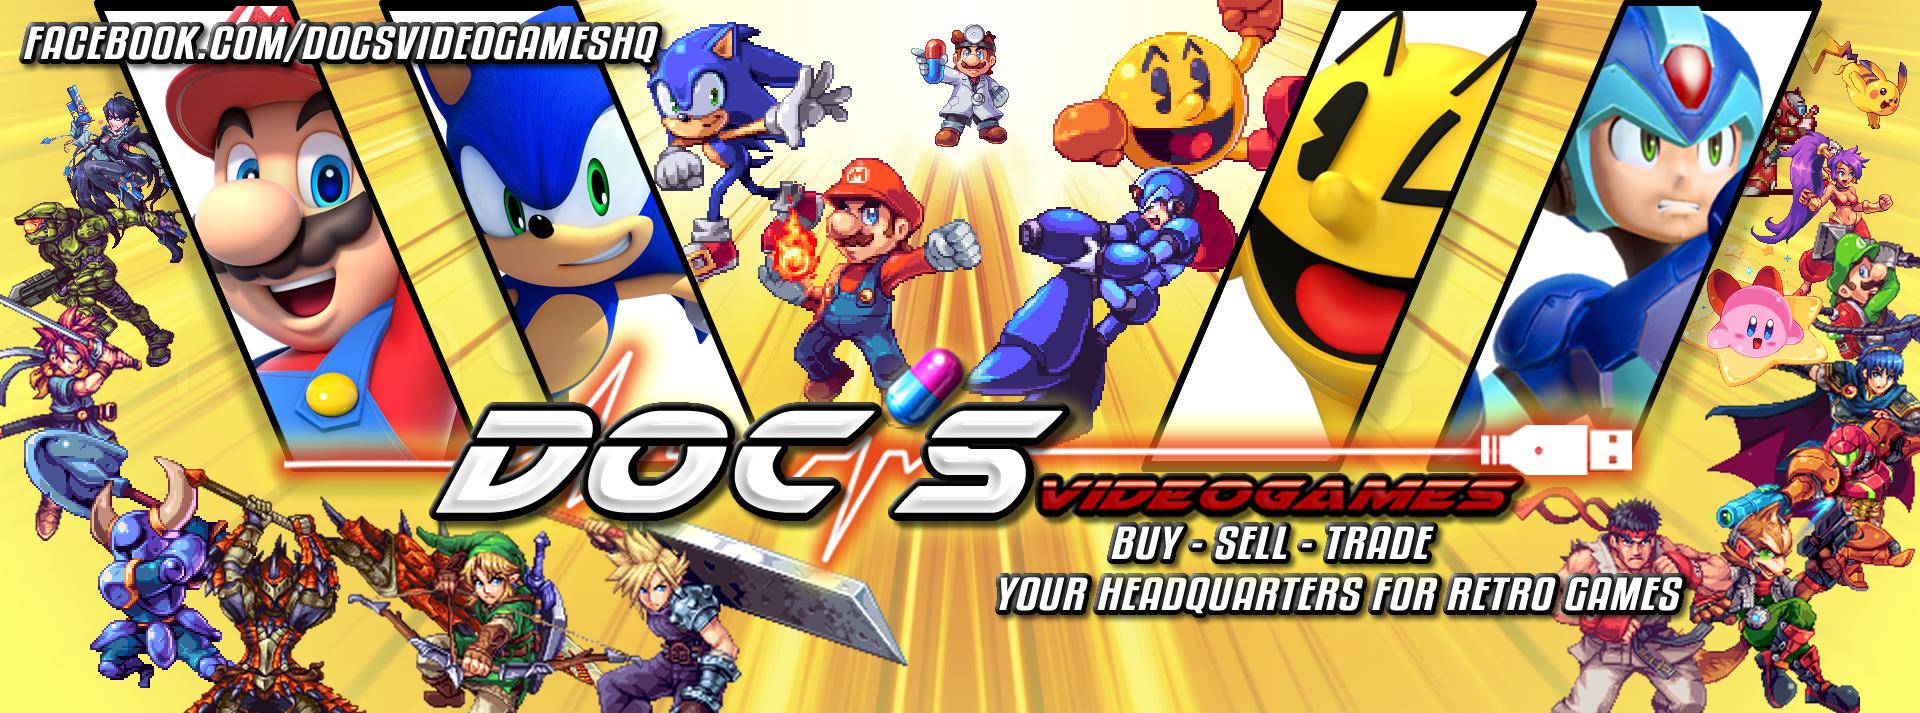 Docs Video Games - Doc's video games